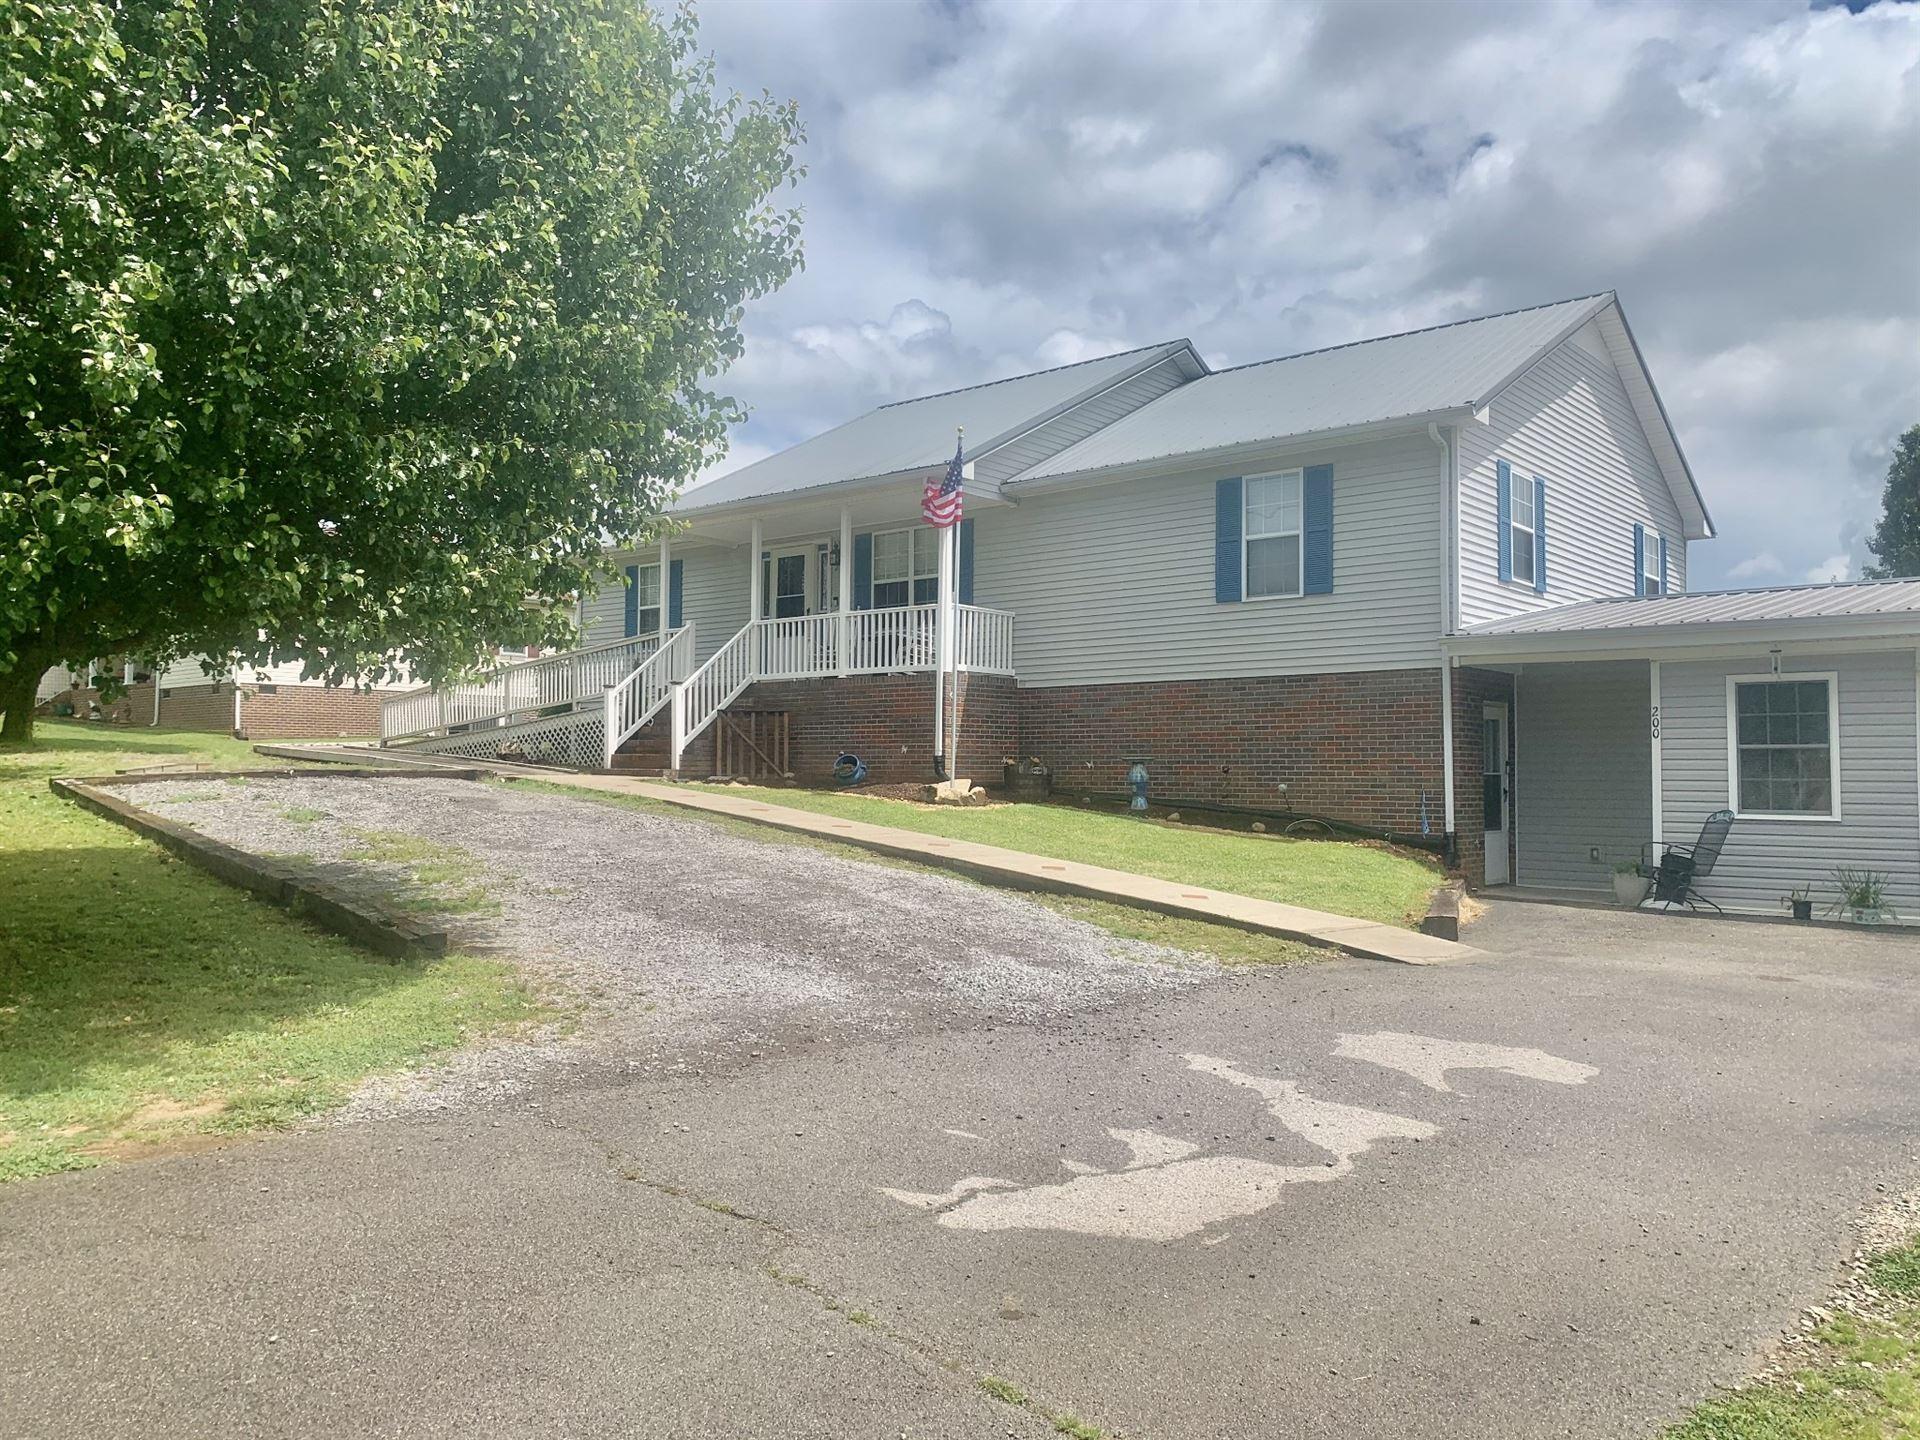 202 Allendale Blvd, McMinnville, TN 37110 - MLS#: 2250214